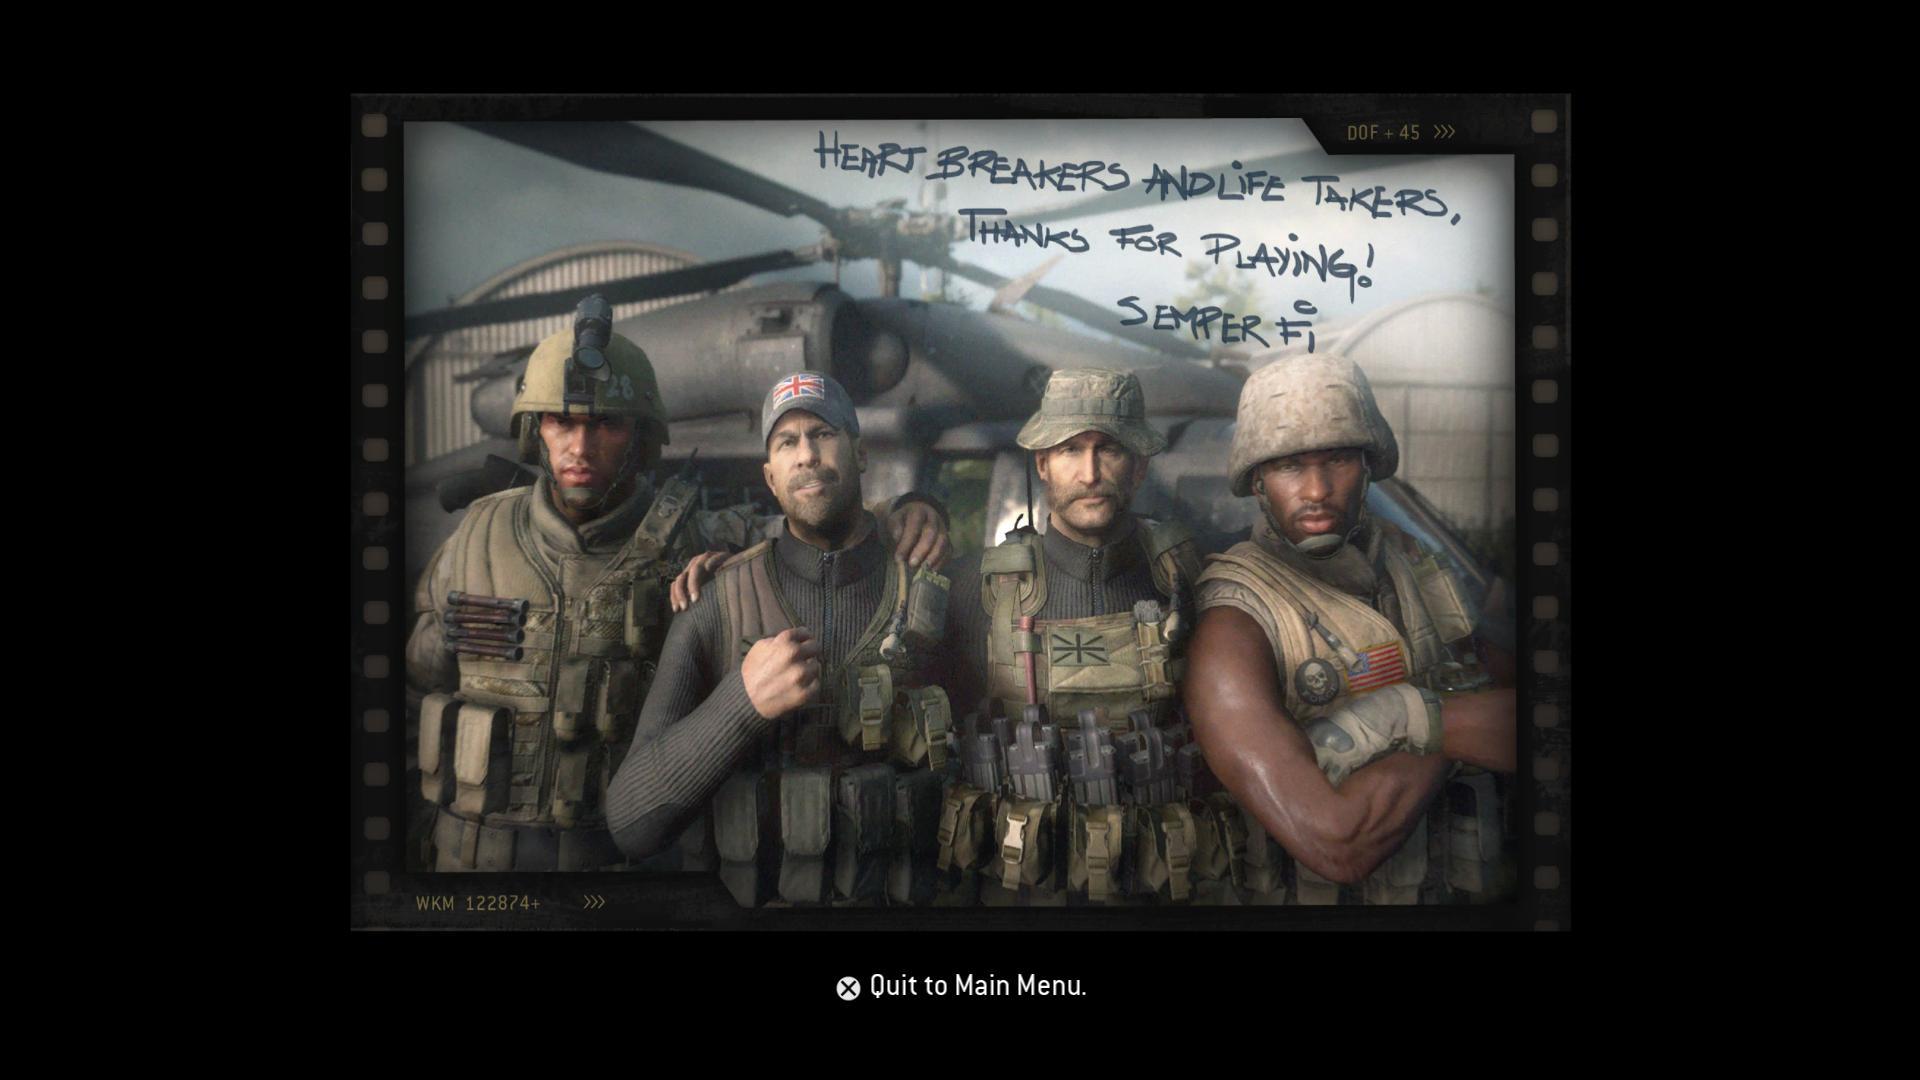 Craig Fairbrass, Billy Murray, David Sobolov, and Mark Grigsby in Call of Duty: Modern Warfare Remastered (2016)